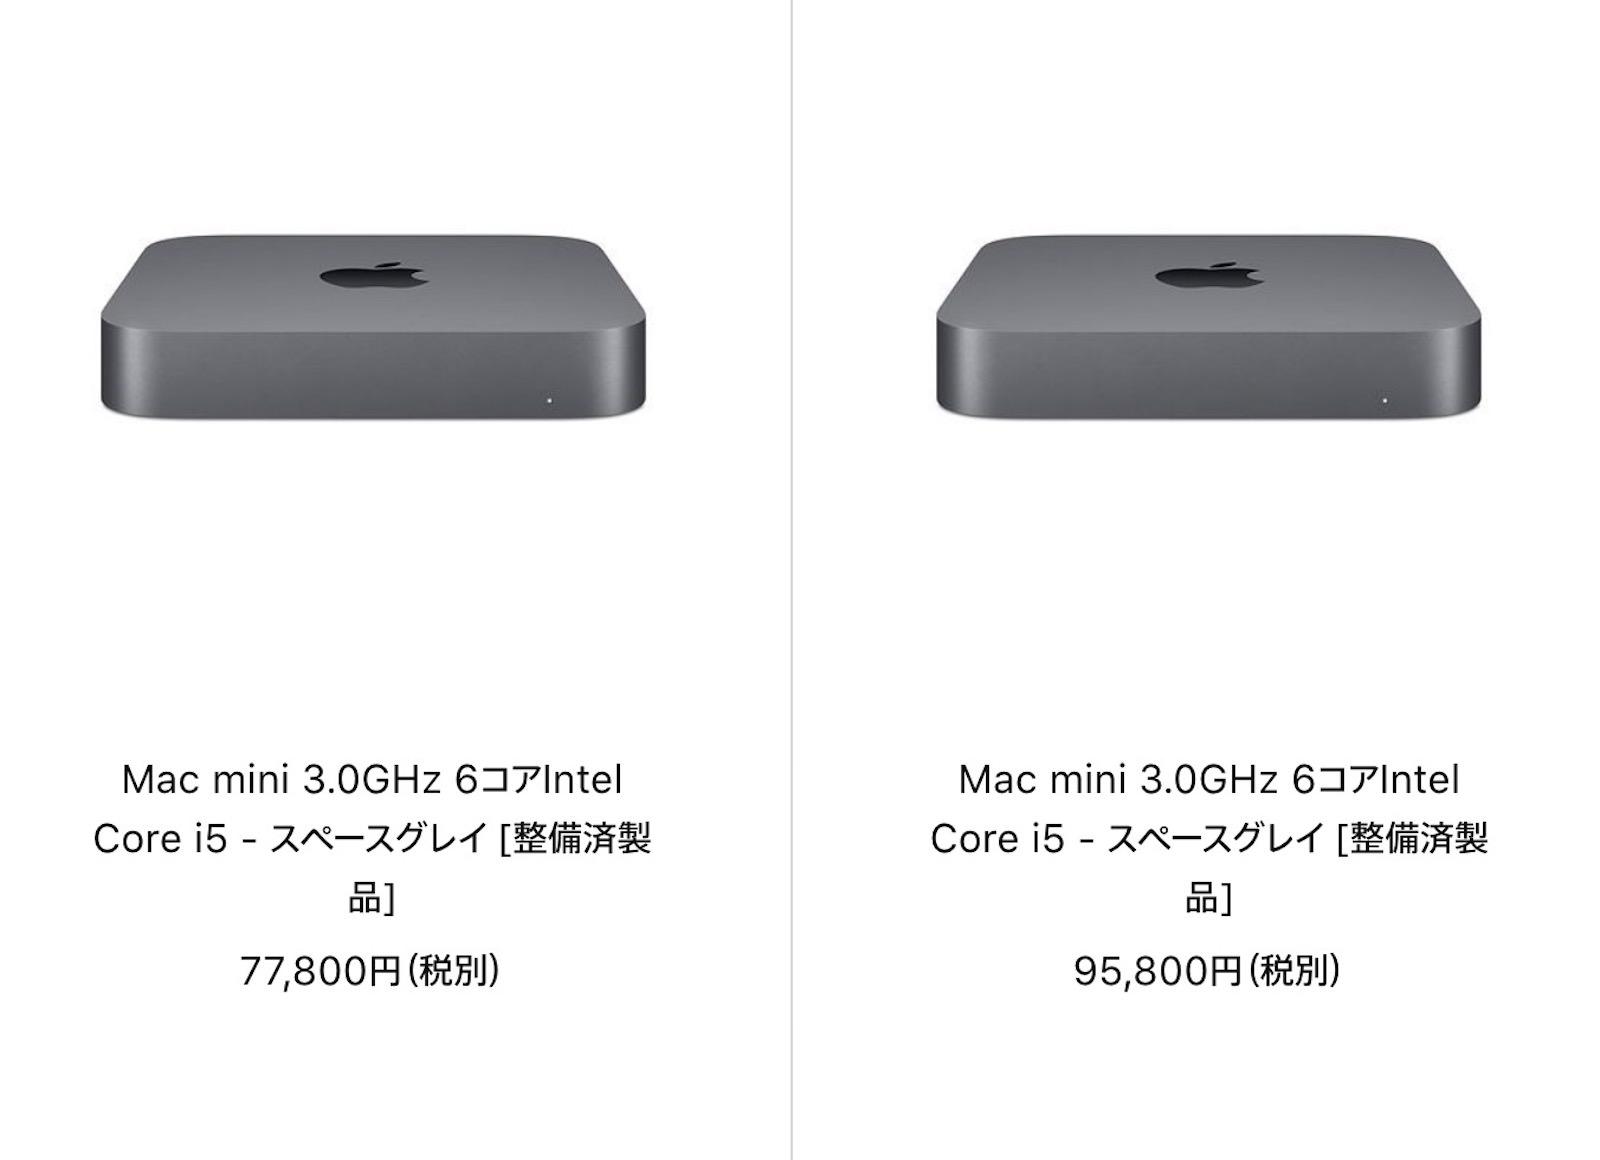 Mac mini 2018 sale